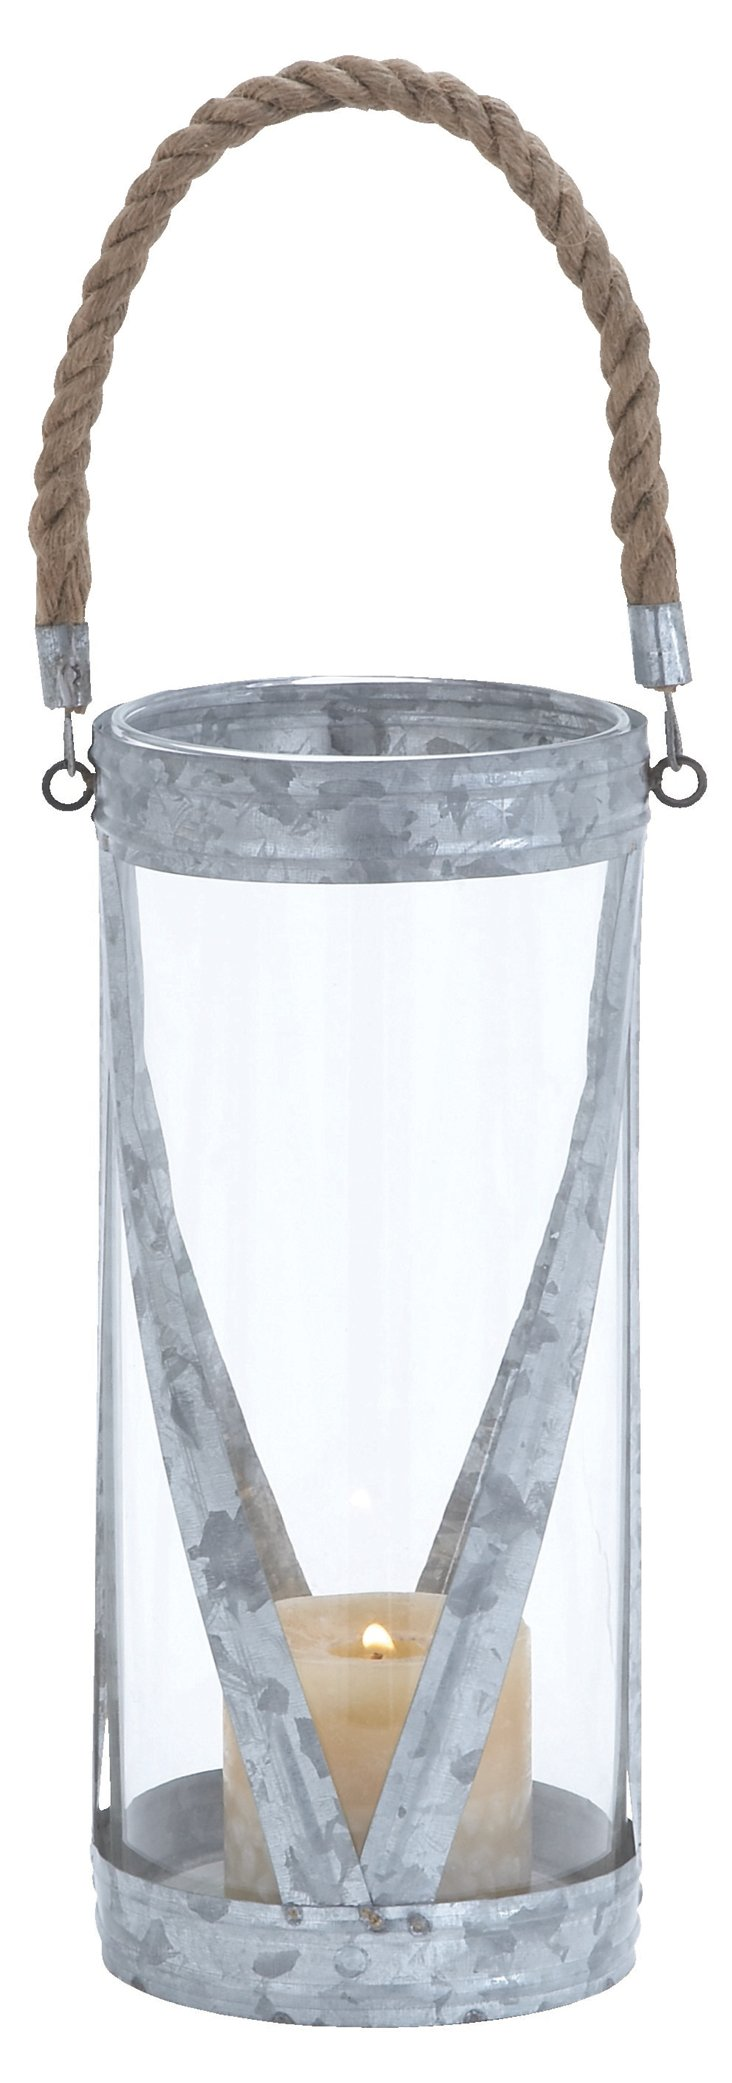 "12"" Metal Rope Candleholder"